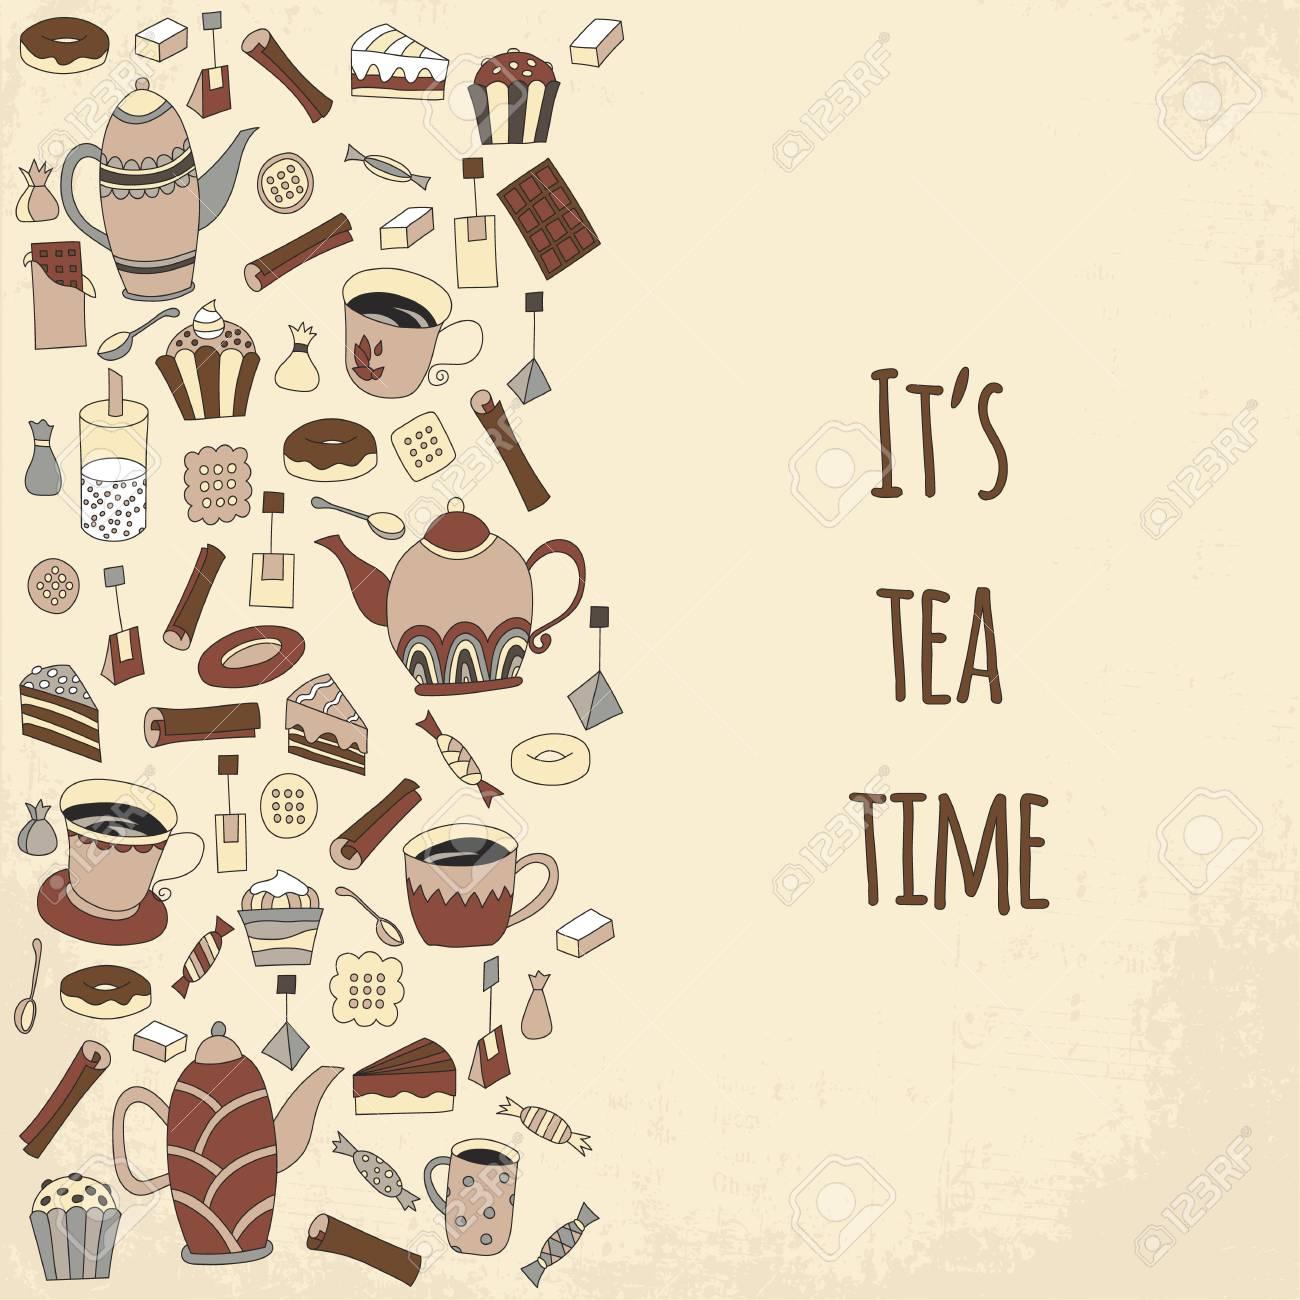 Tea Time Vector Illustration Hand Drawn Retro Design Cute Cafe Or Restaurant Menu Template